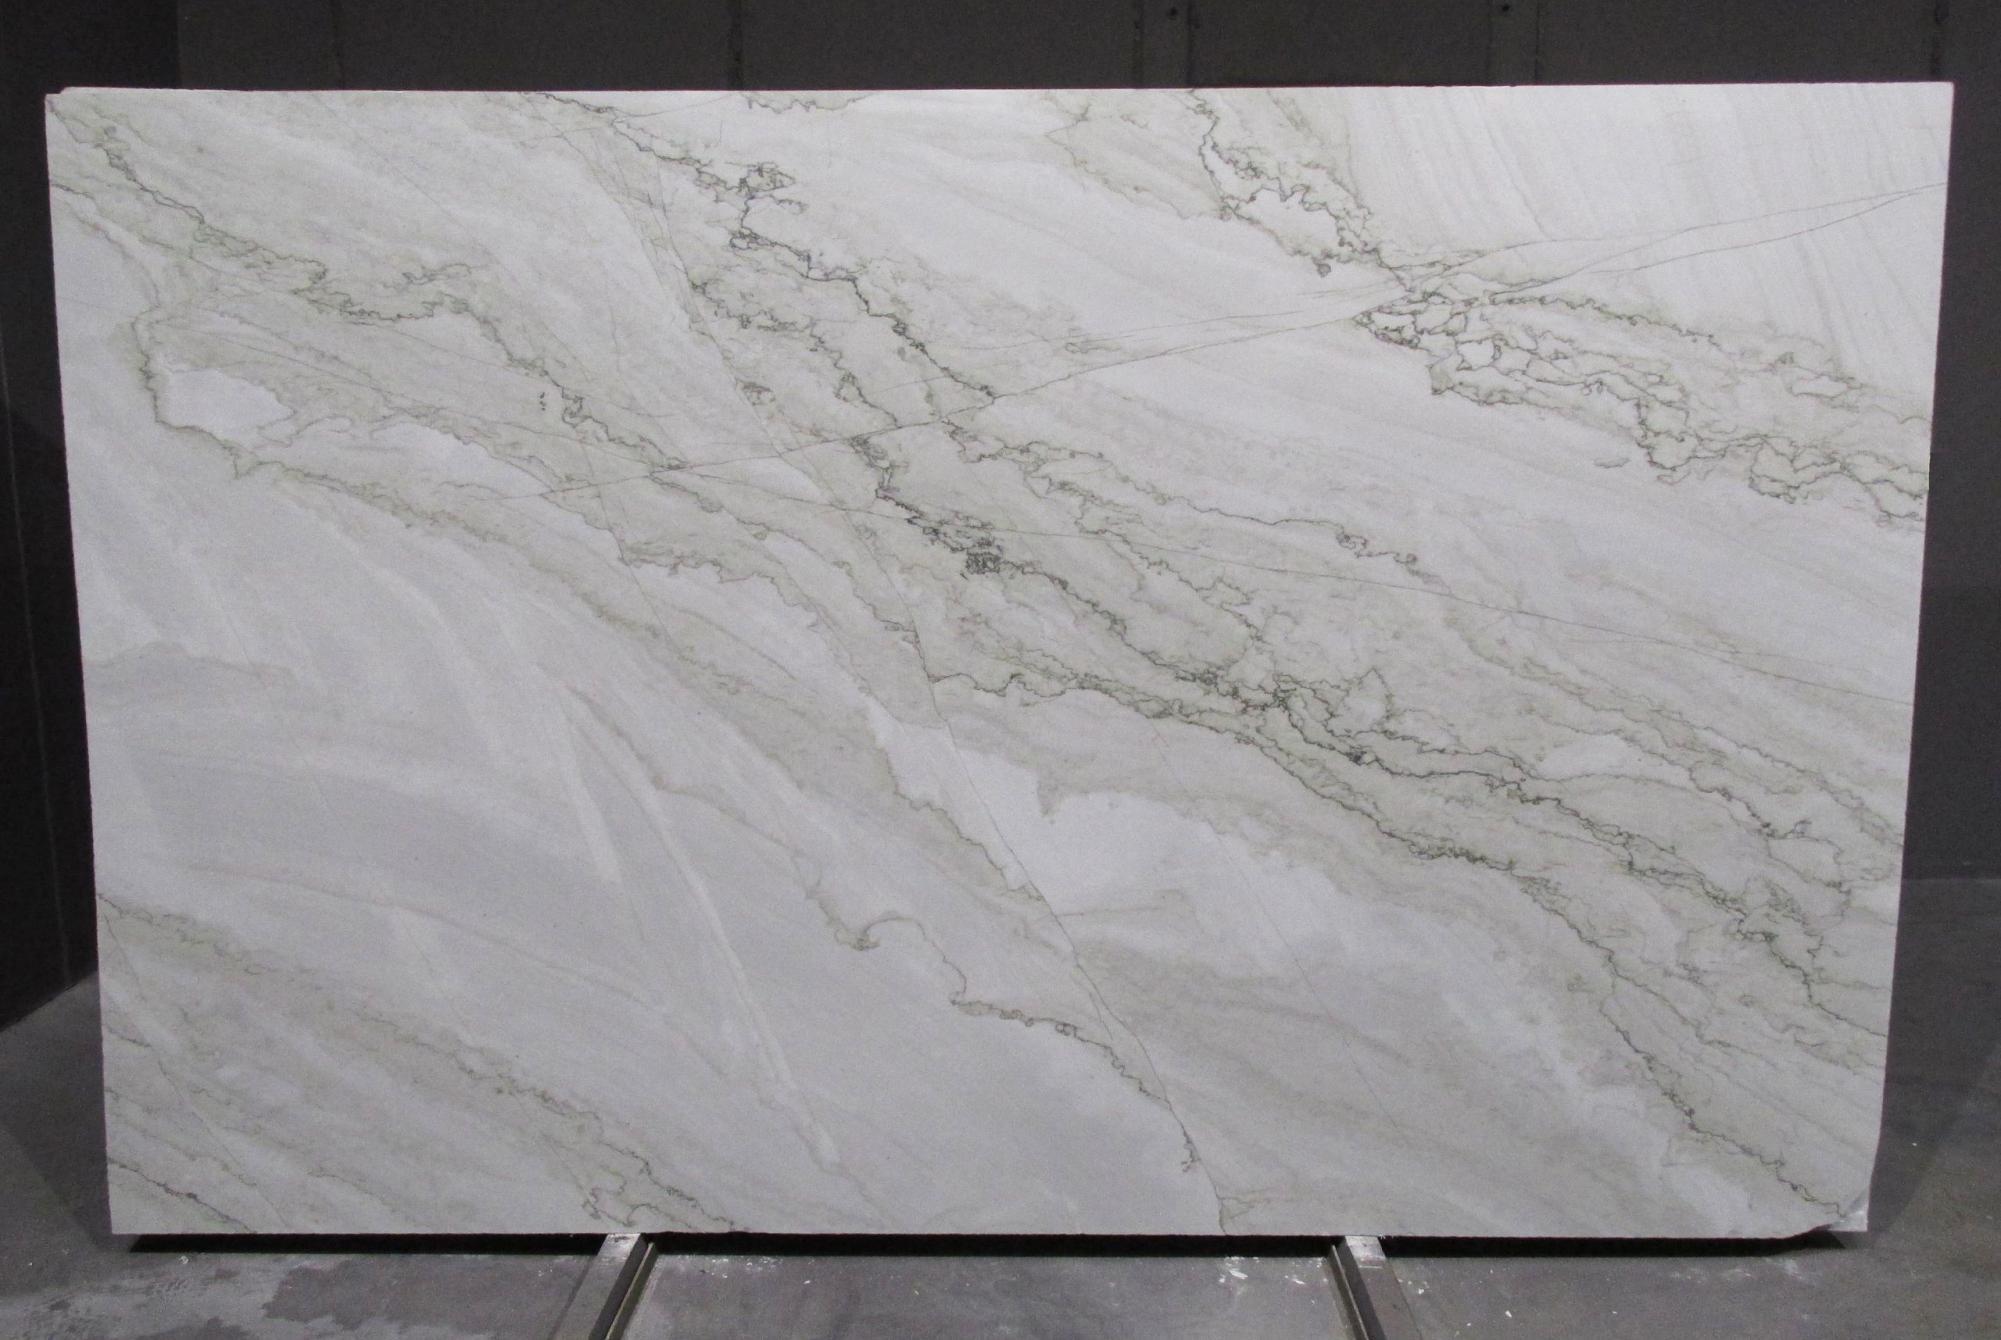 SUPREME PEARL Supply Veneto (Italy) polished slabs 1492G , Bnds 2cm natural quartzite